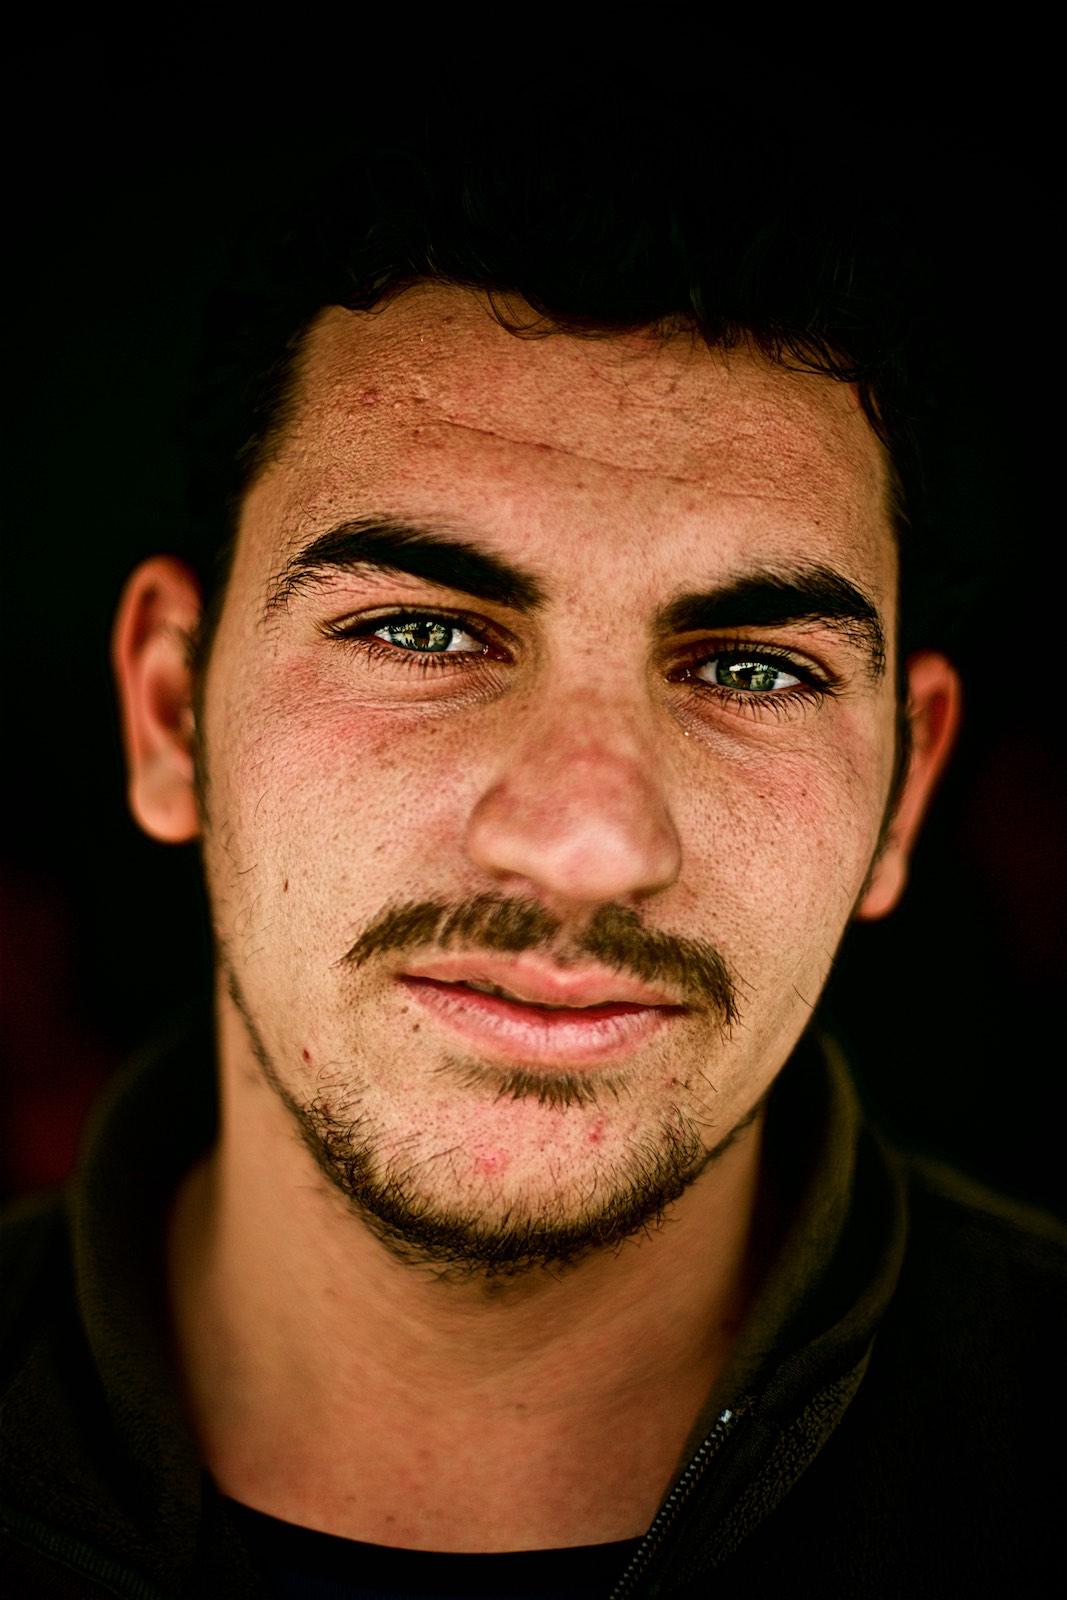 denis-bosnic-zaatari-jordan-refugee-camp-15.jpg